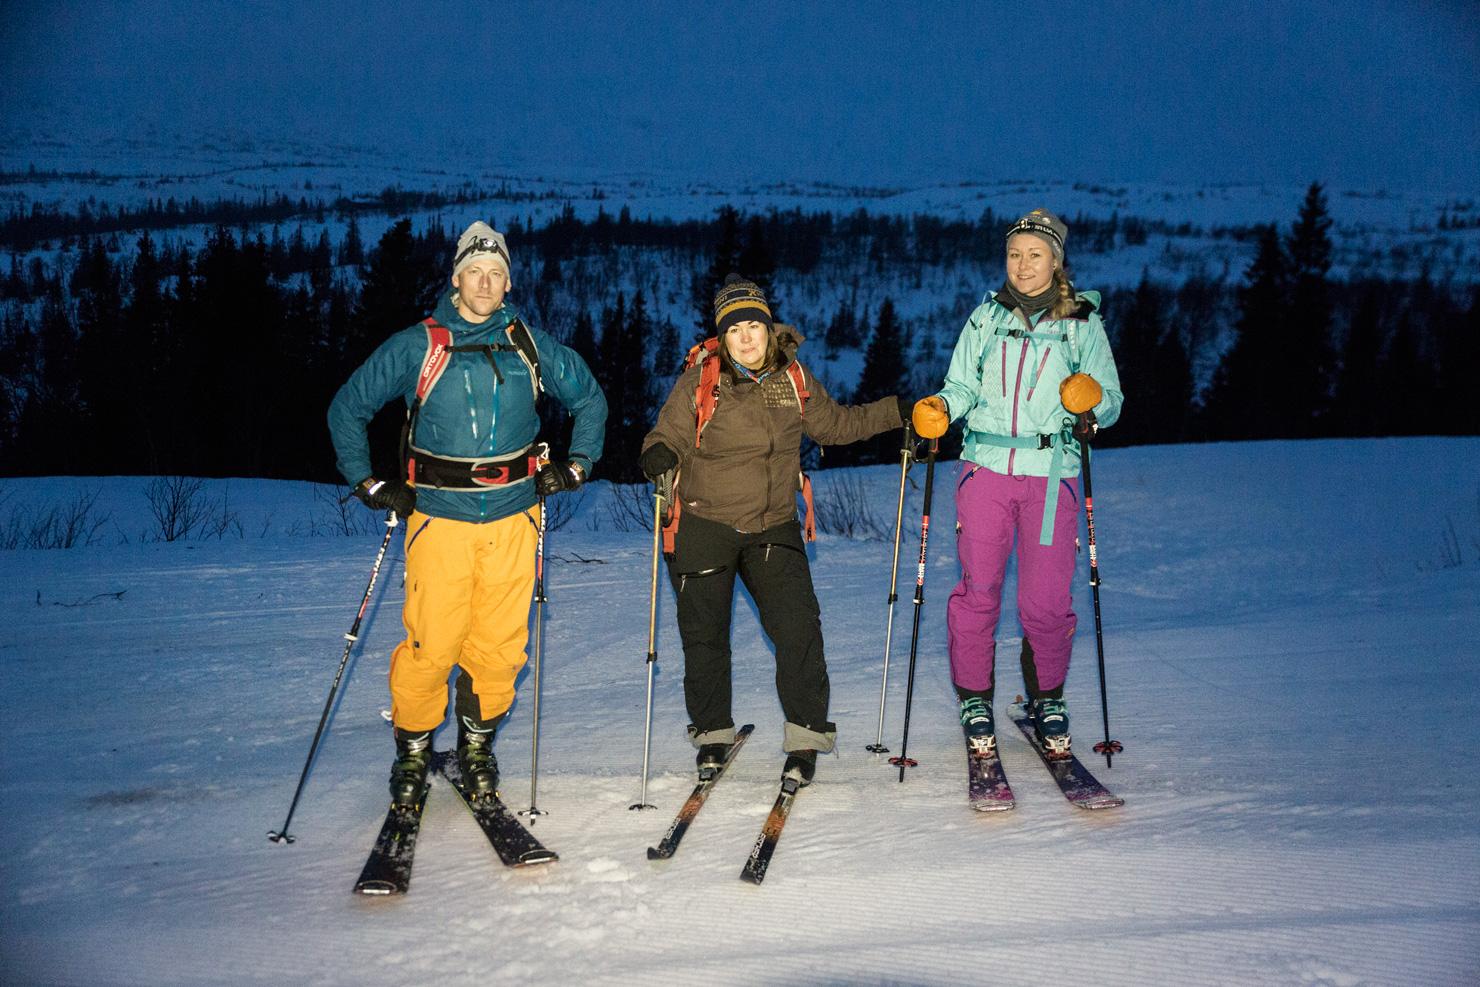 Ulladalen